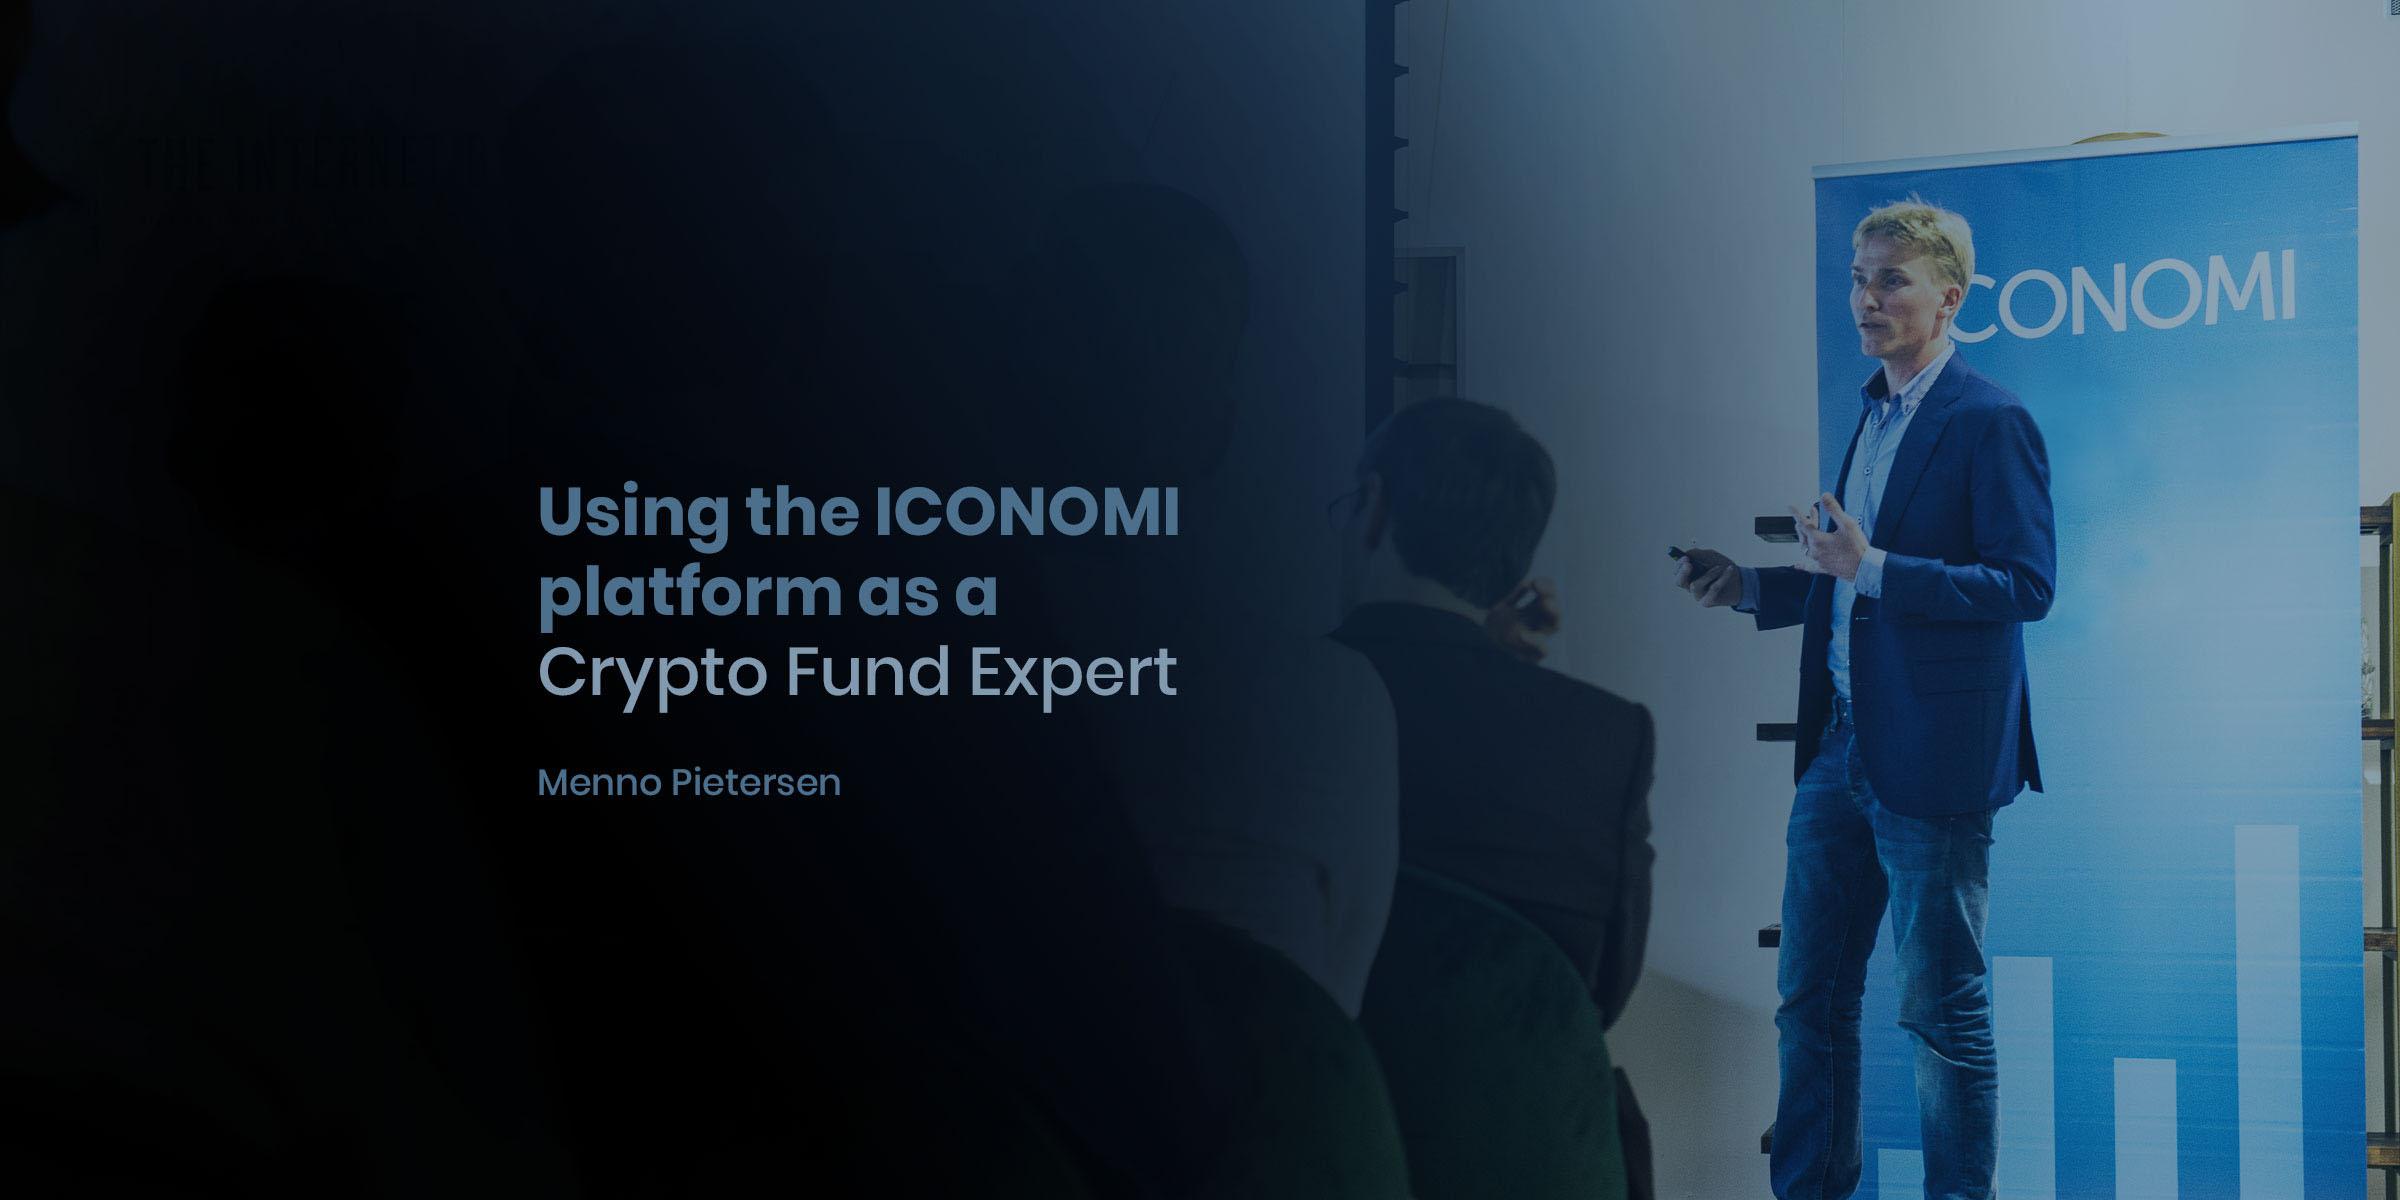 Using the ICONOMI platform as a Crypto Fund Expert